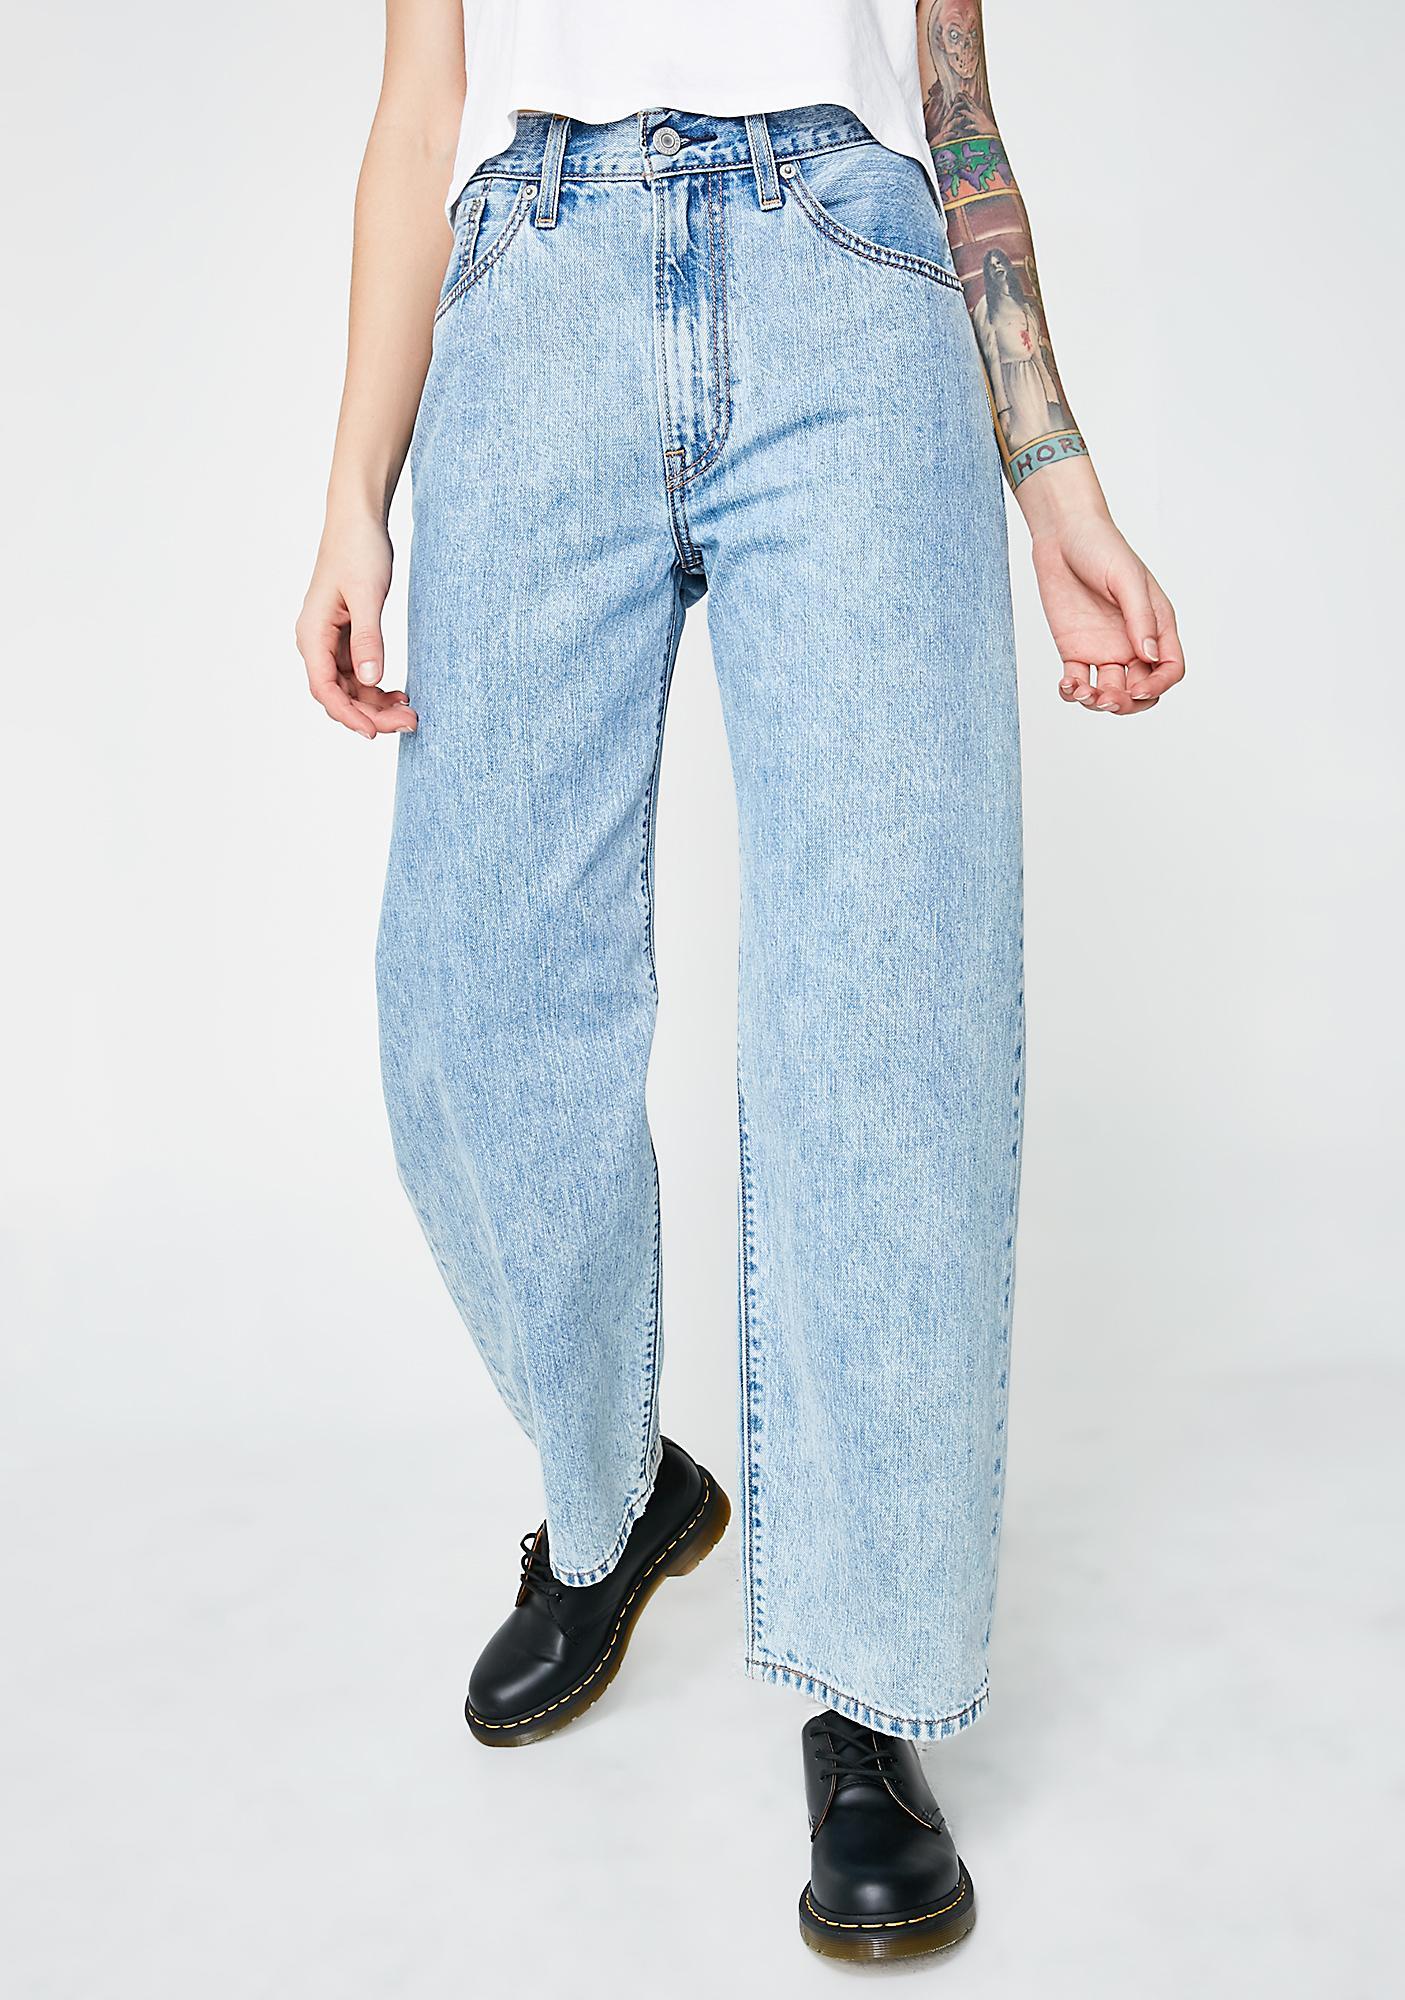 Levis Real World Denim Jeans